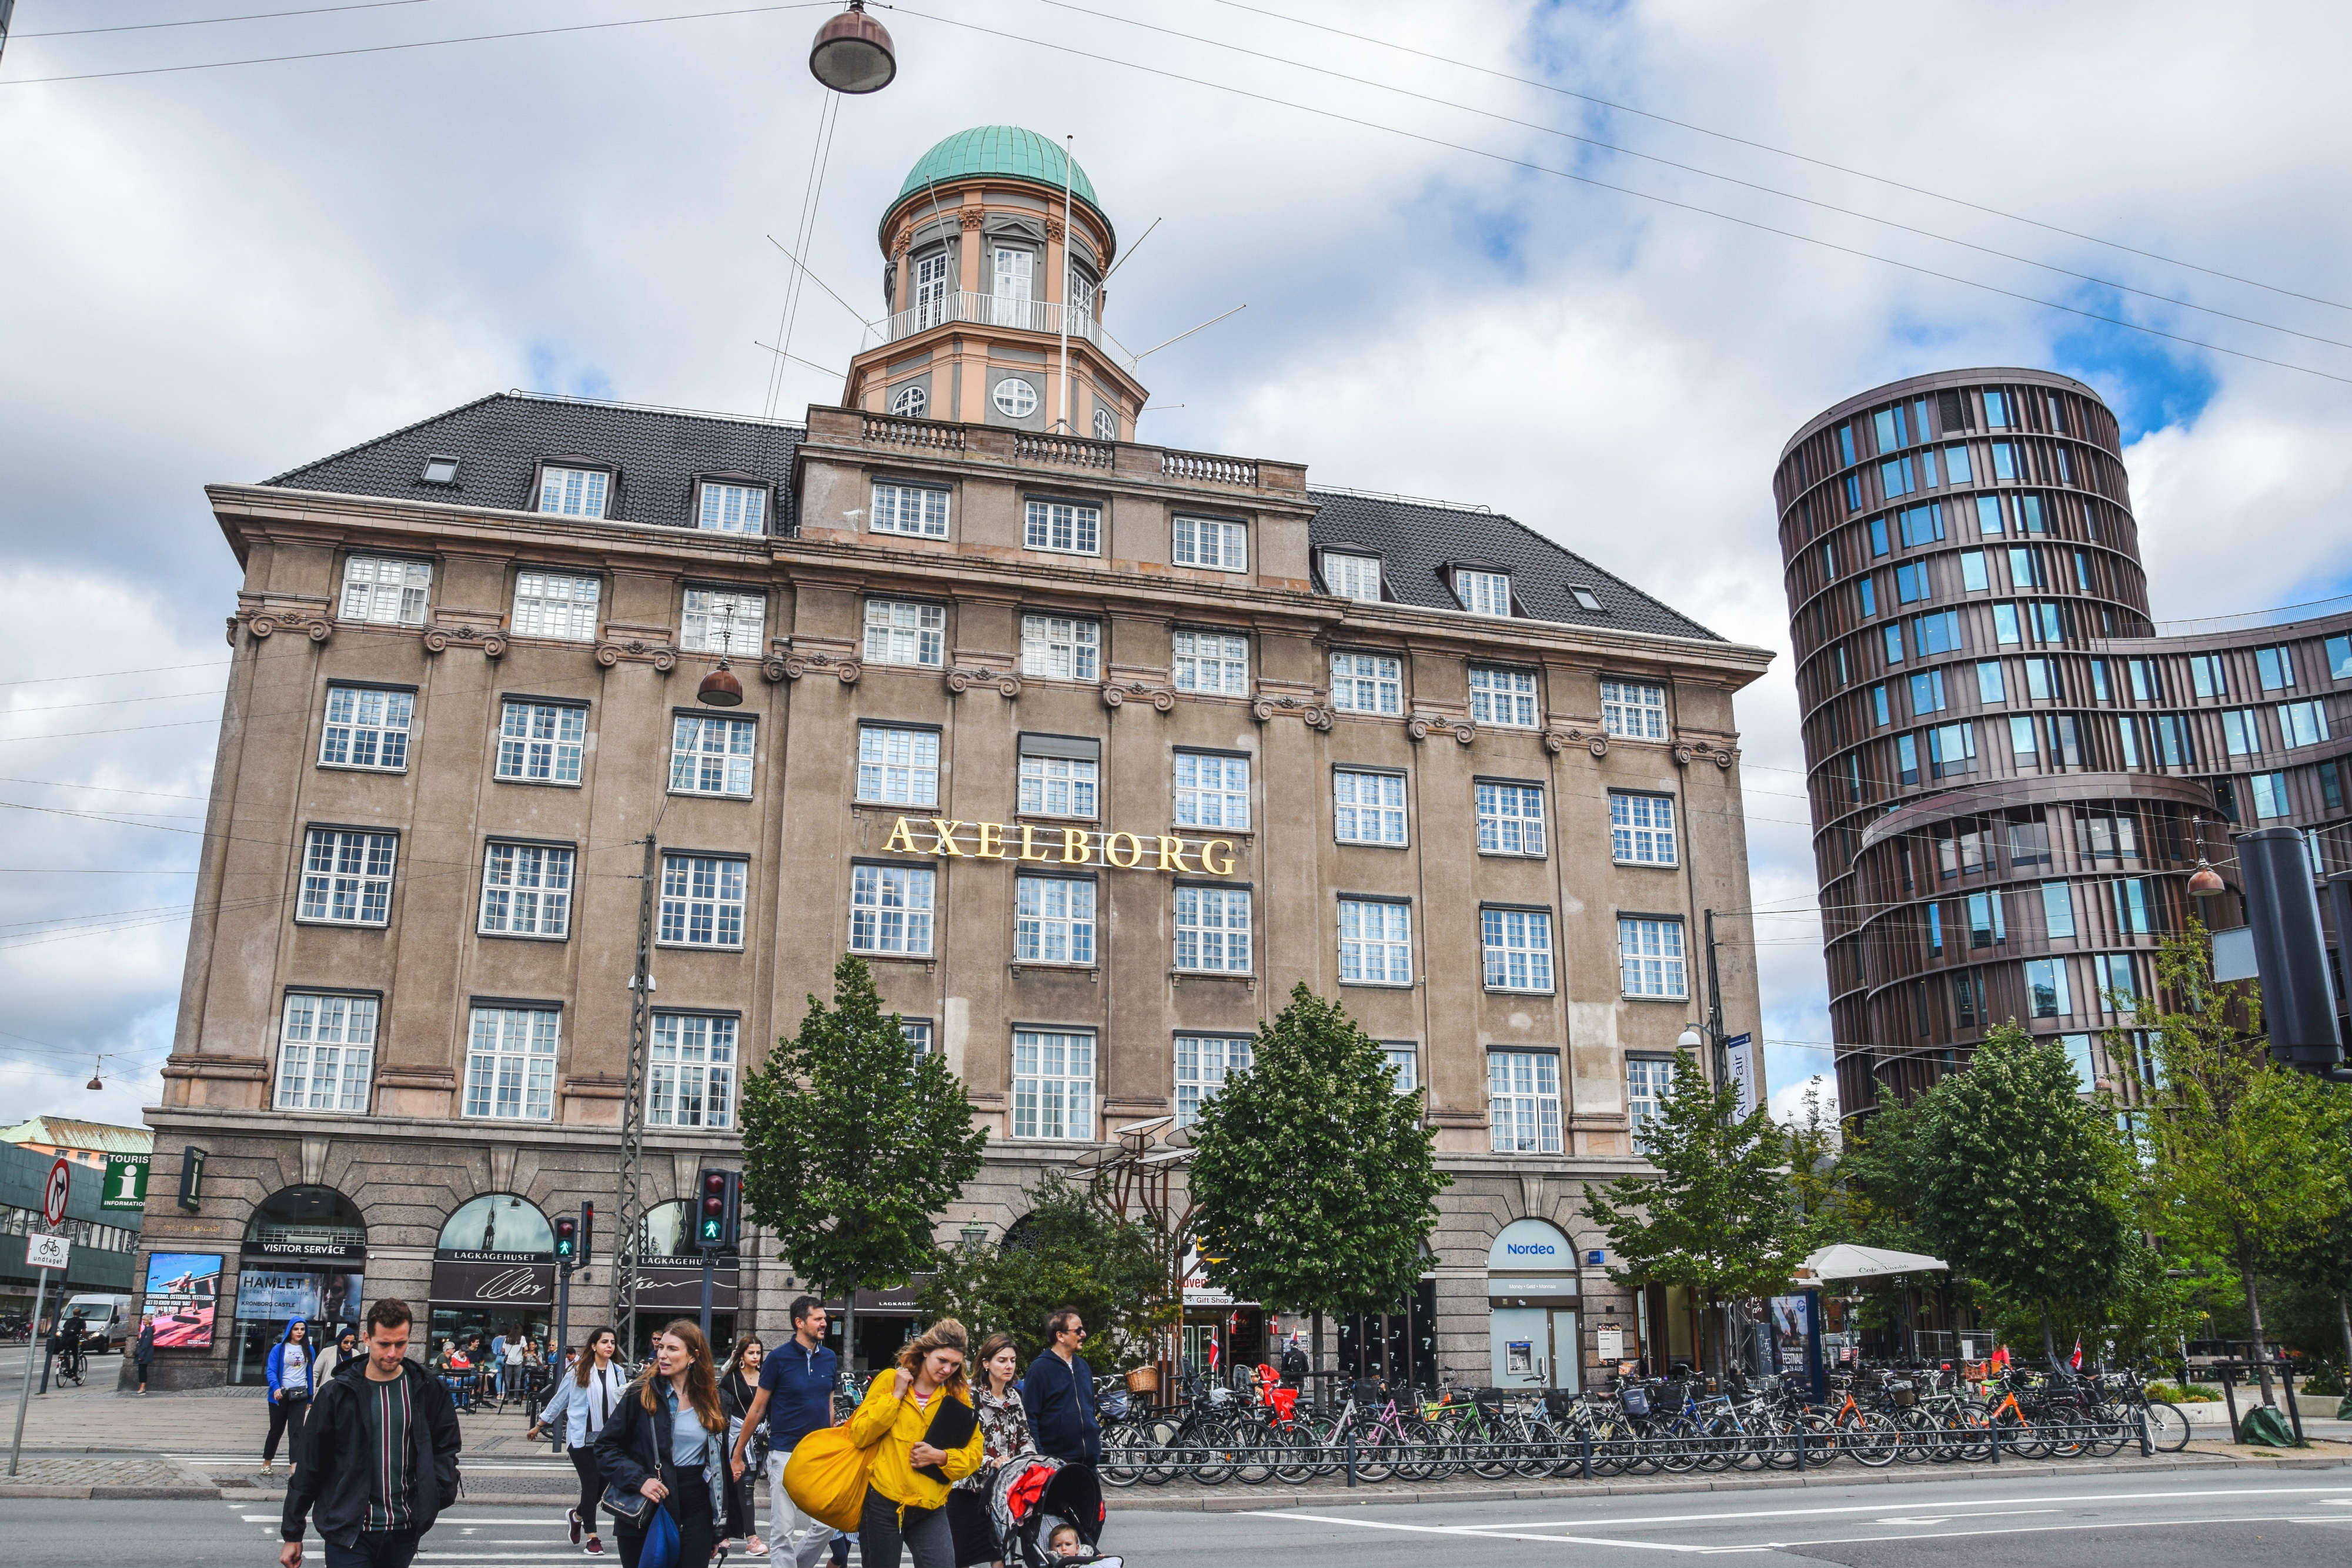 Axelborg overfor Tivolis hovedindgang, hvor Tivoli overtager konferencelokalerne. Pressefoto fra Tivoli.